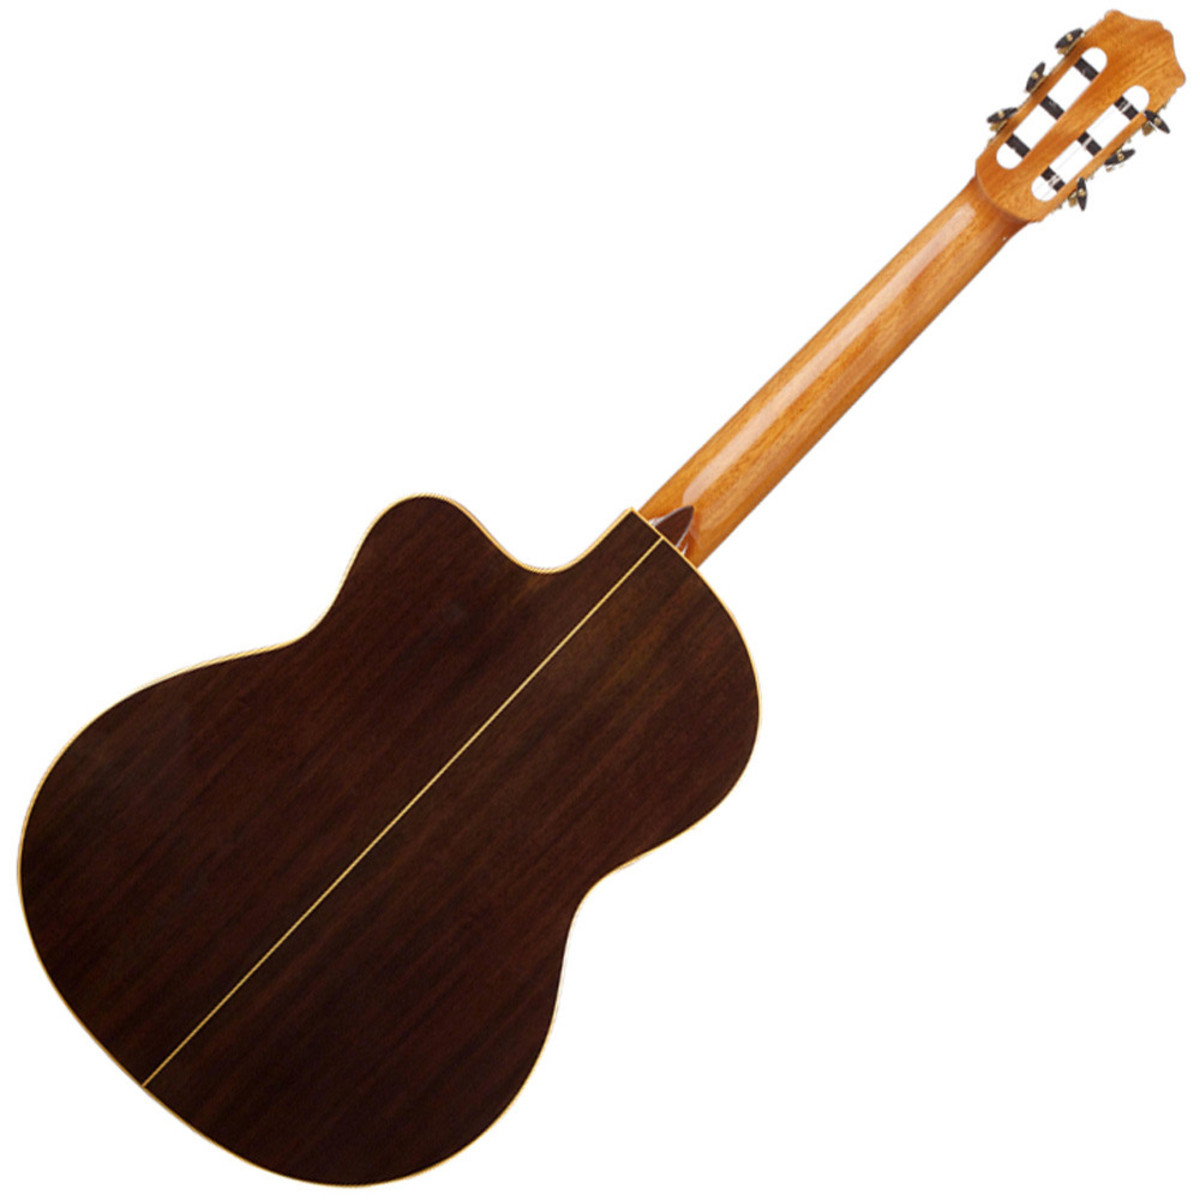 Guitares, Basses, Accessoires Cordoba Gk Studio Negra Ltd Guitare Flamenco Electro Housse Instruments De Musique